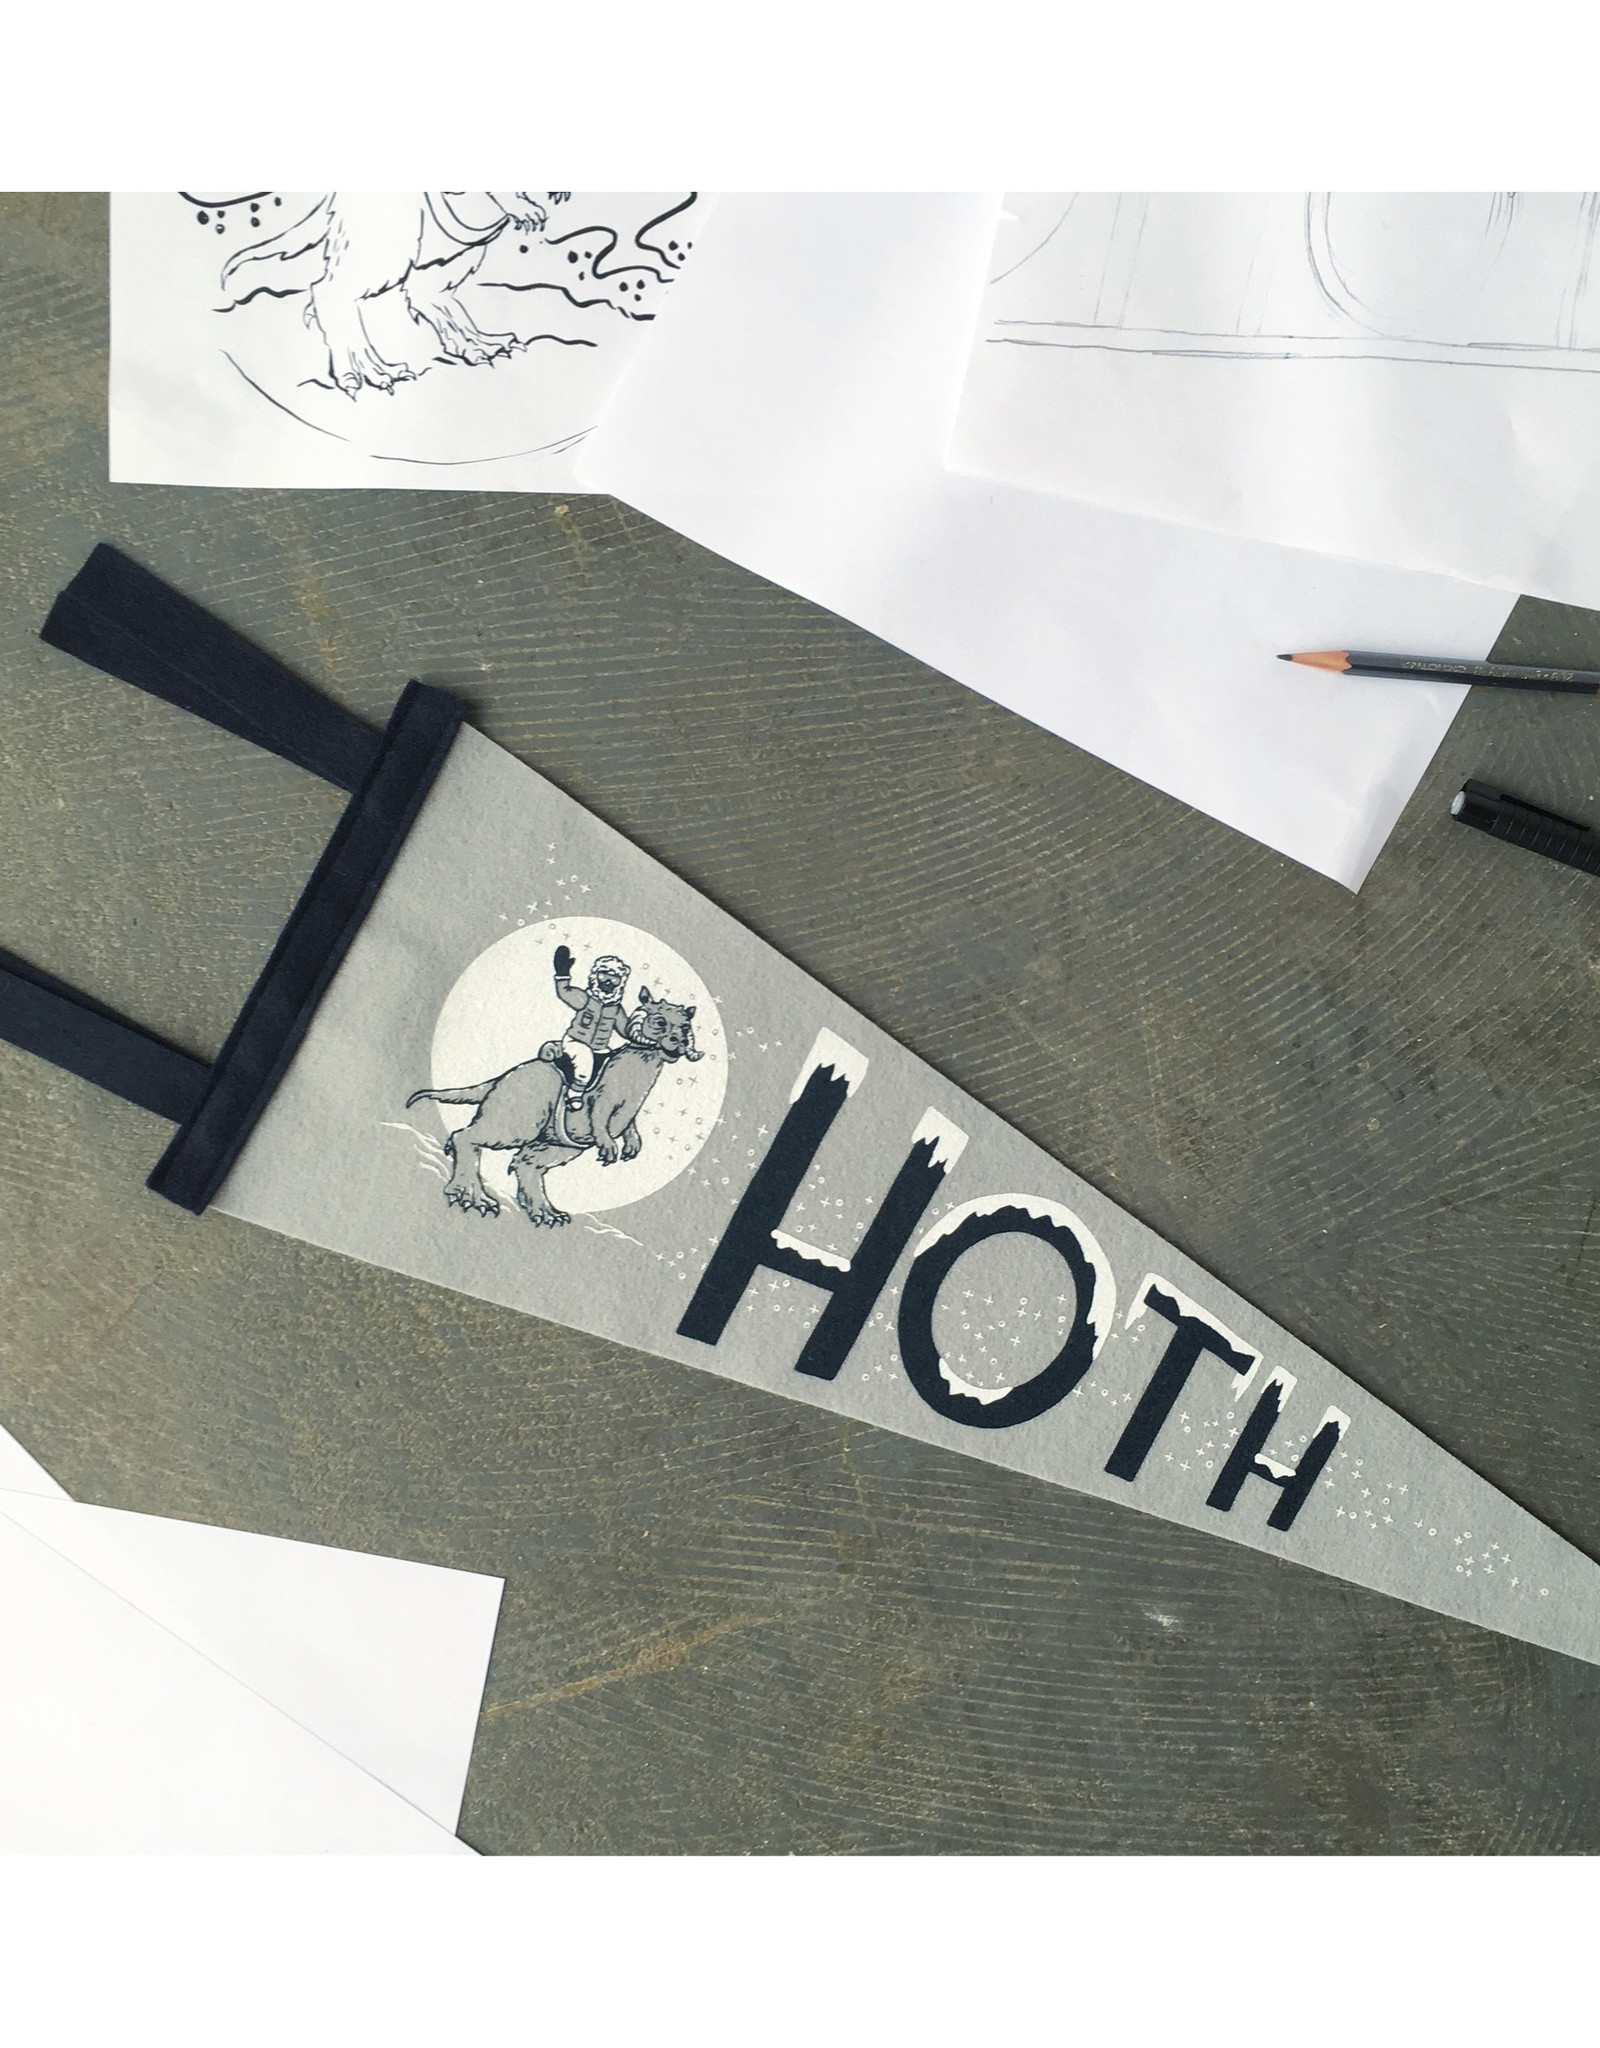 Star Wars - Hoth Pennant